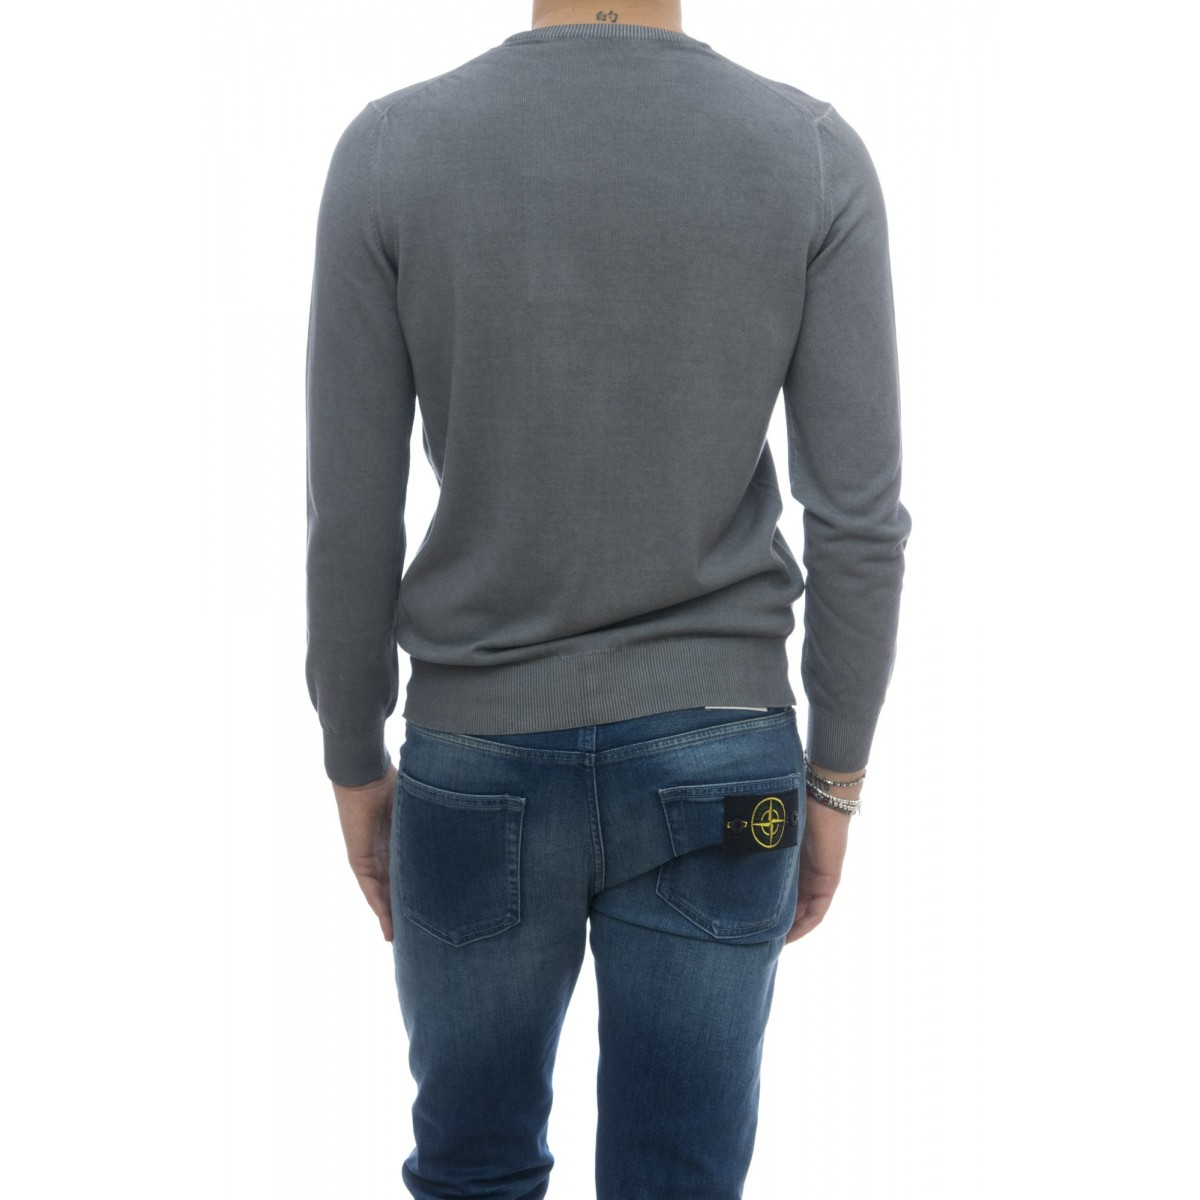 Maglia uomo - 5010/01 magklia giro lavata a freddo